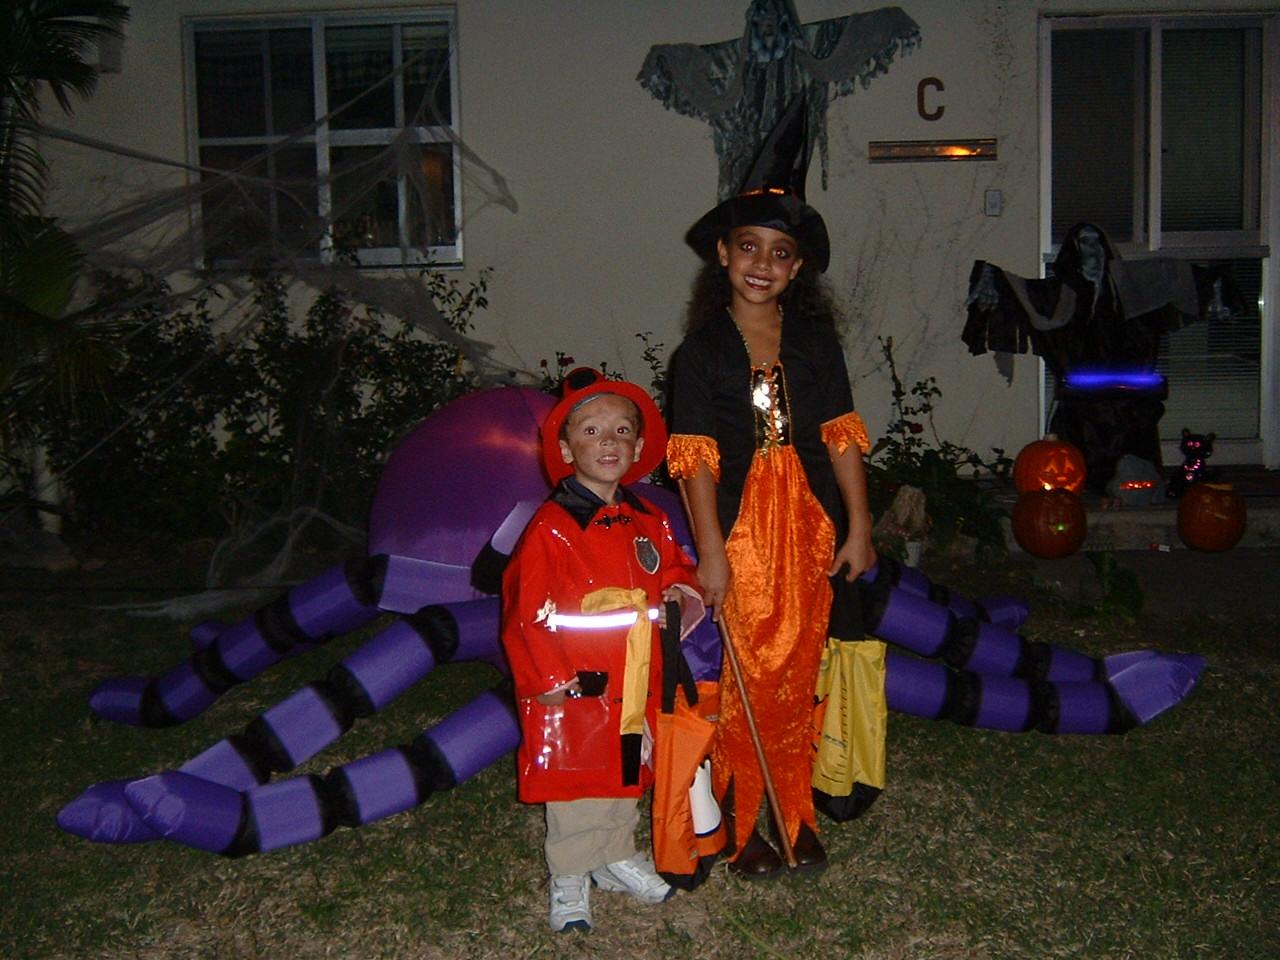 Elijah and Chloe in costume